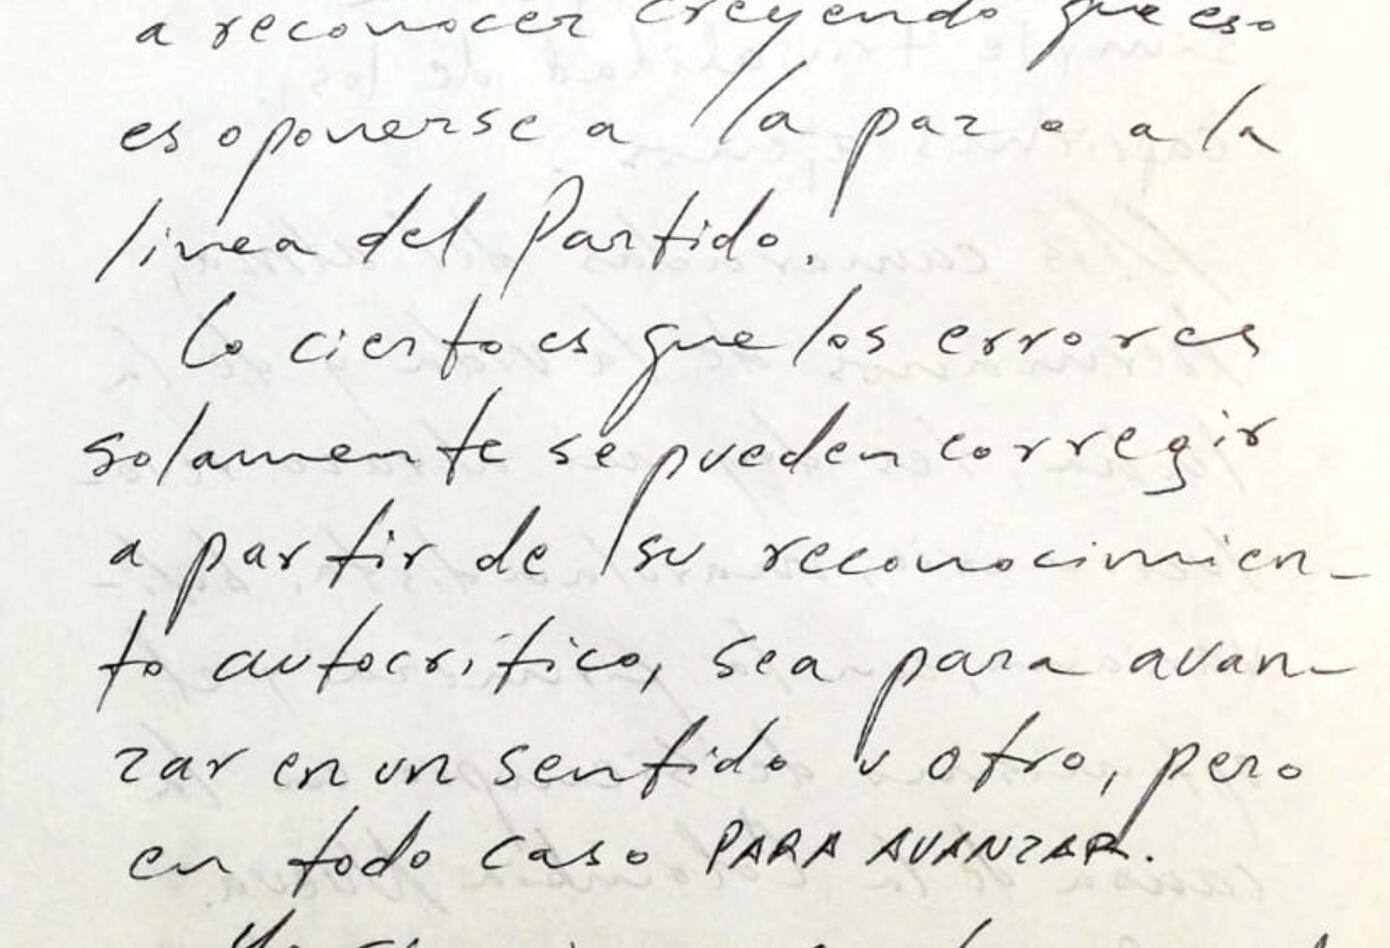 Carta Jesús Santrich 2